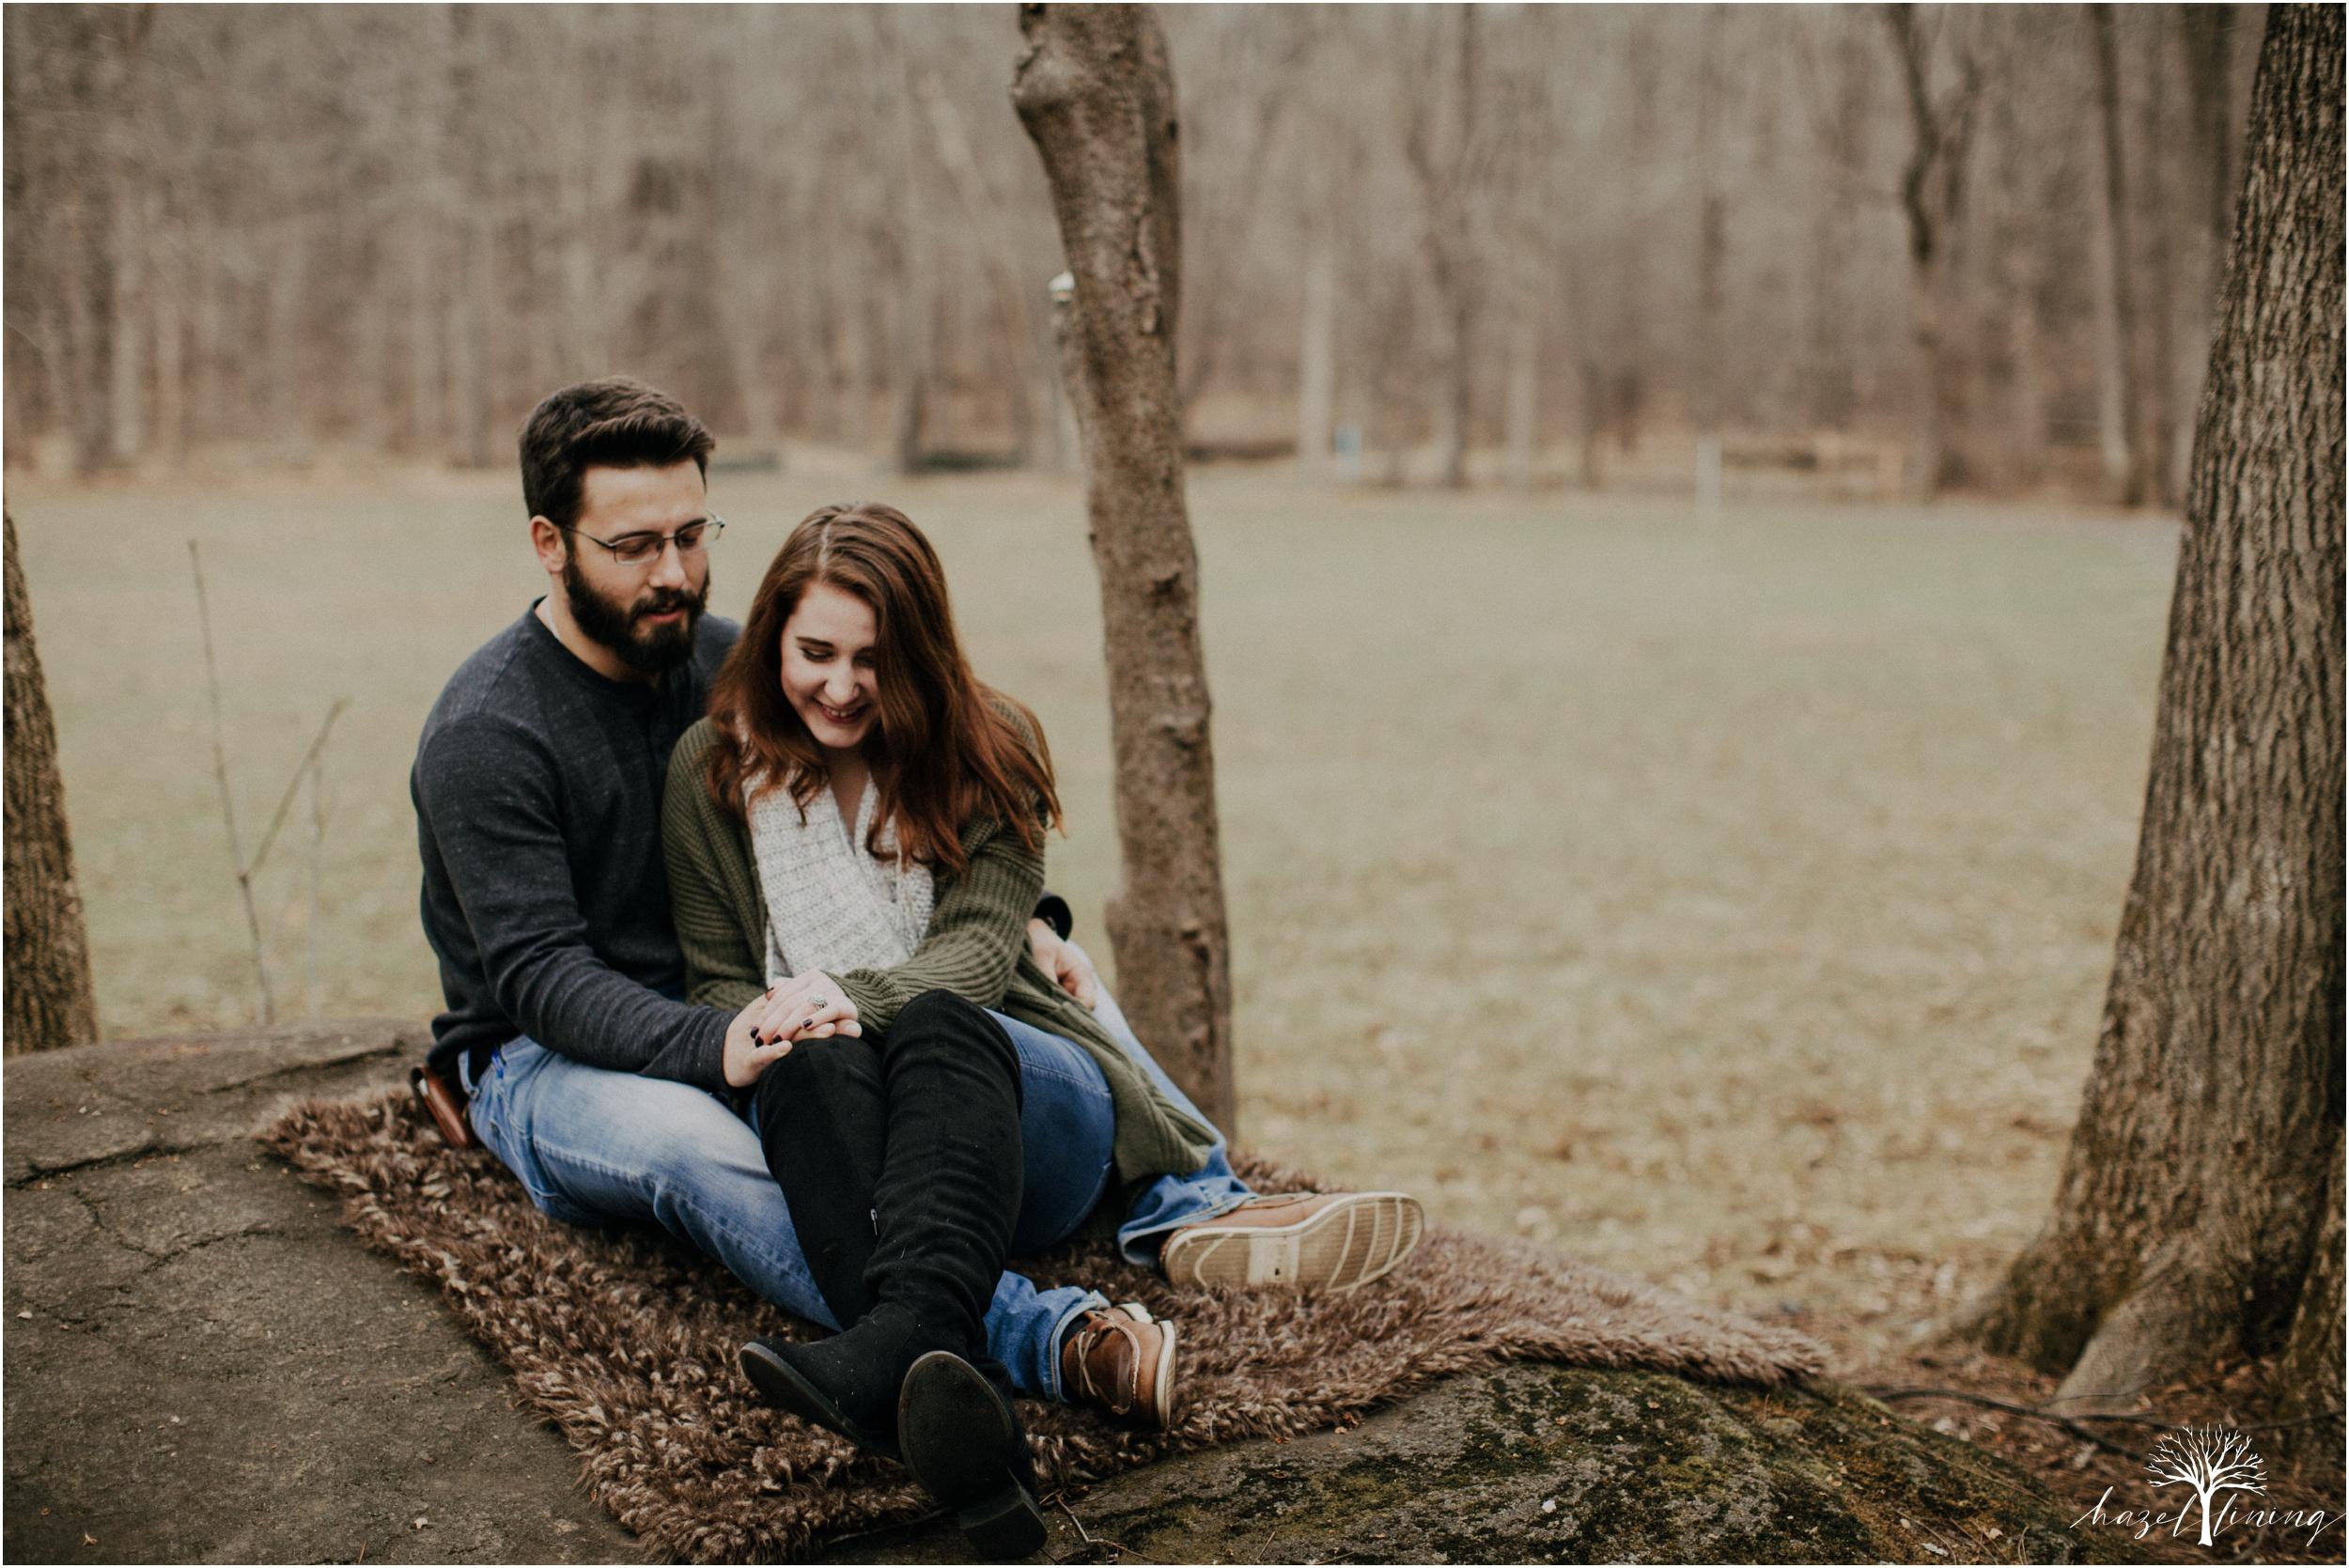 evan-maggie-lesh-one-year-anniversary-winter-shoot-camp-menolan-pennsylvania_0008.jpg